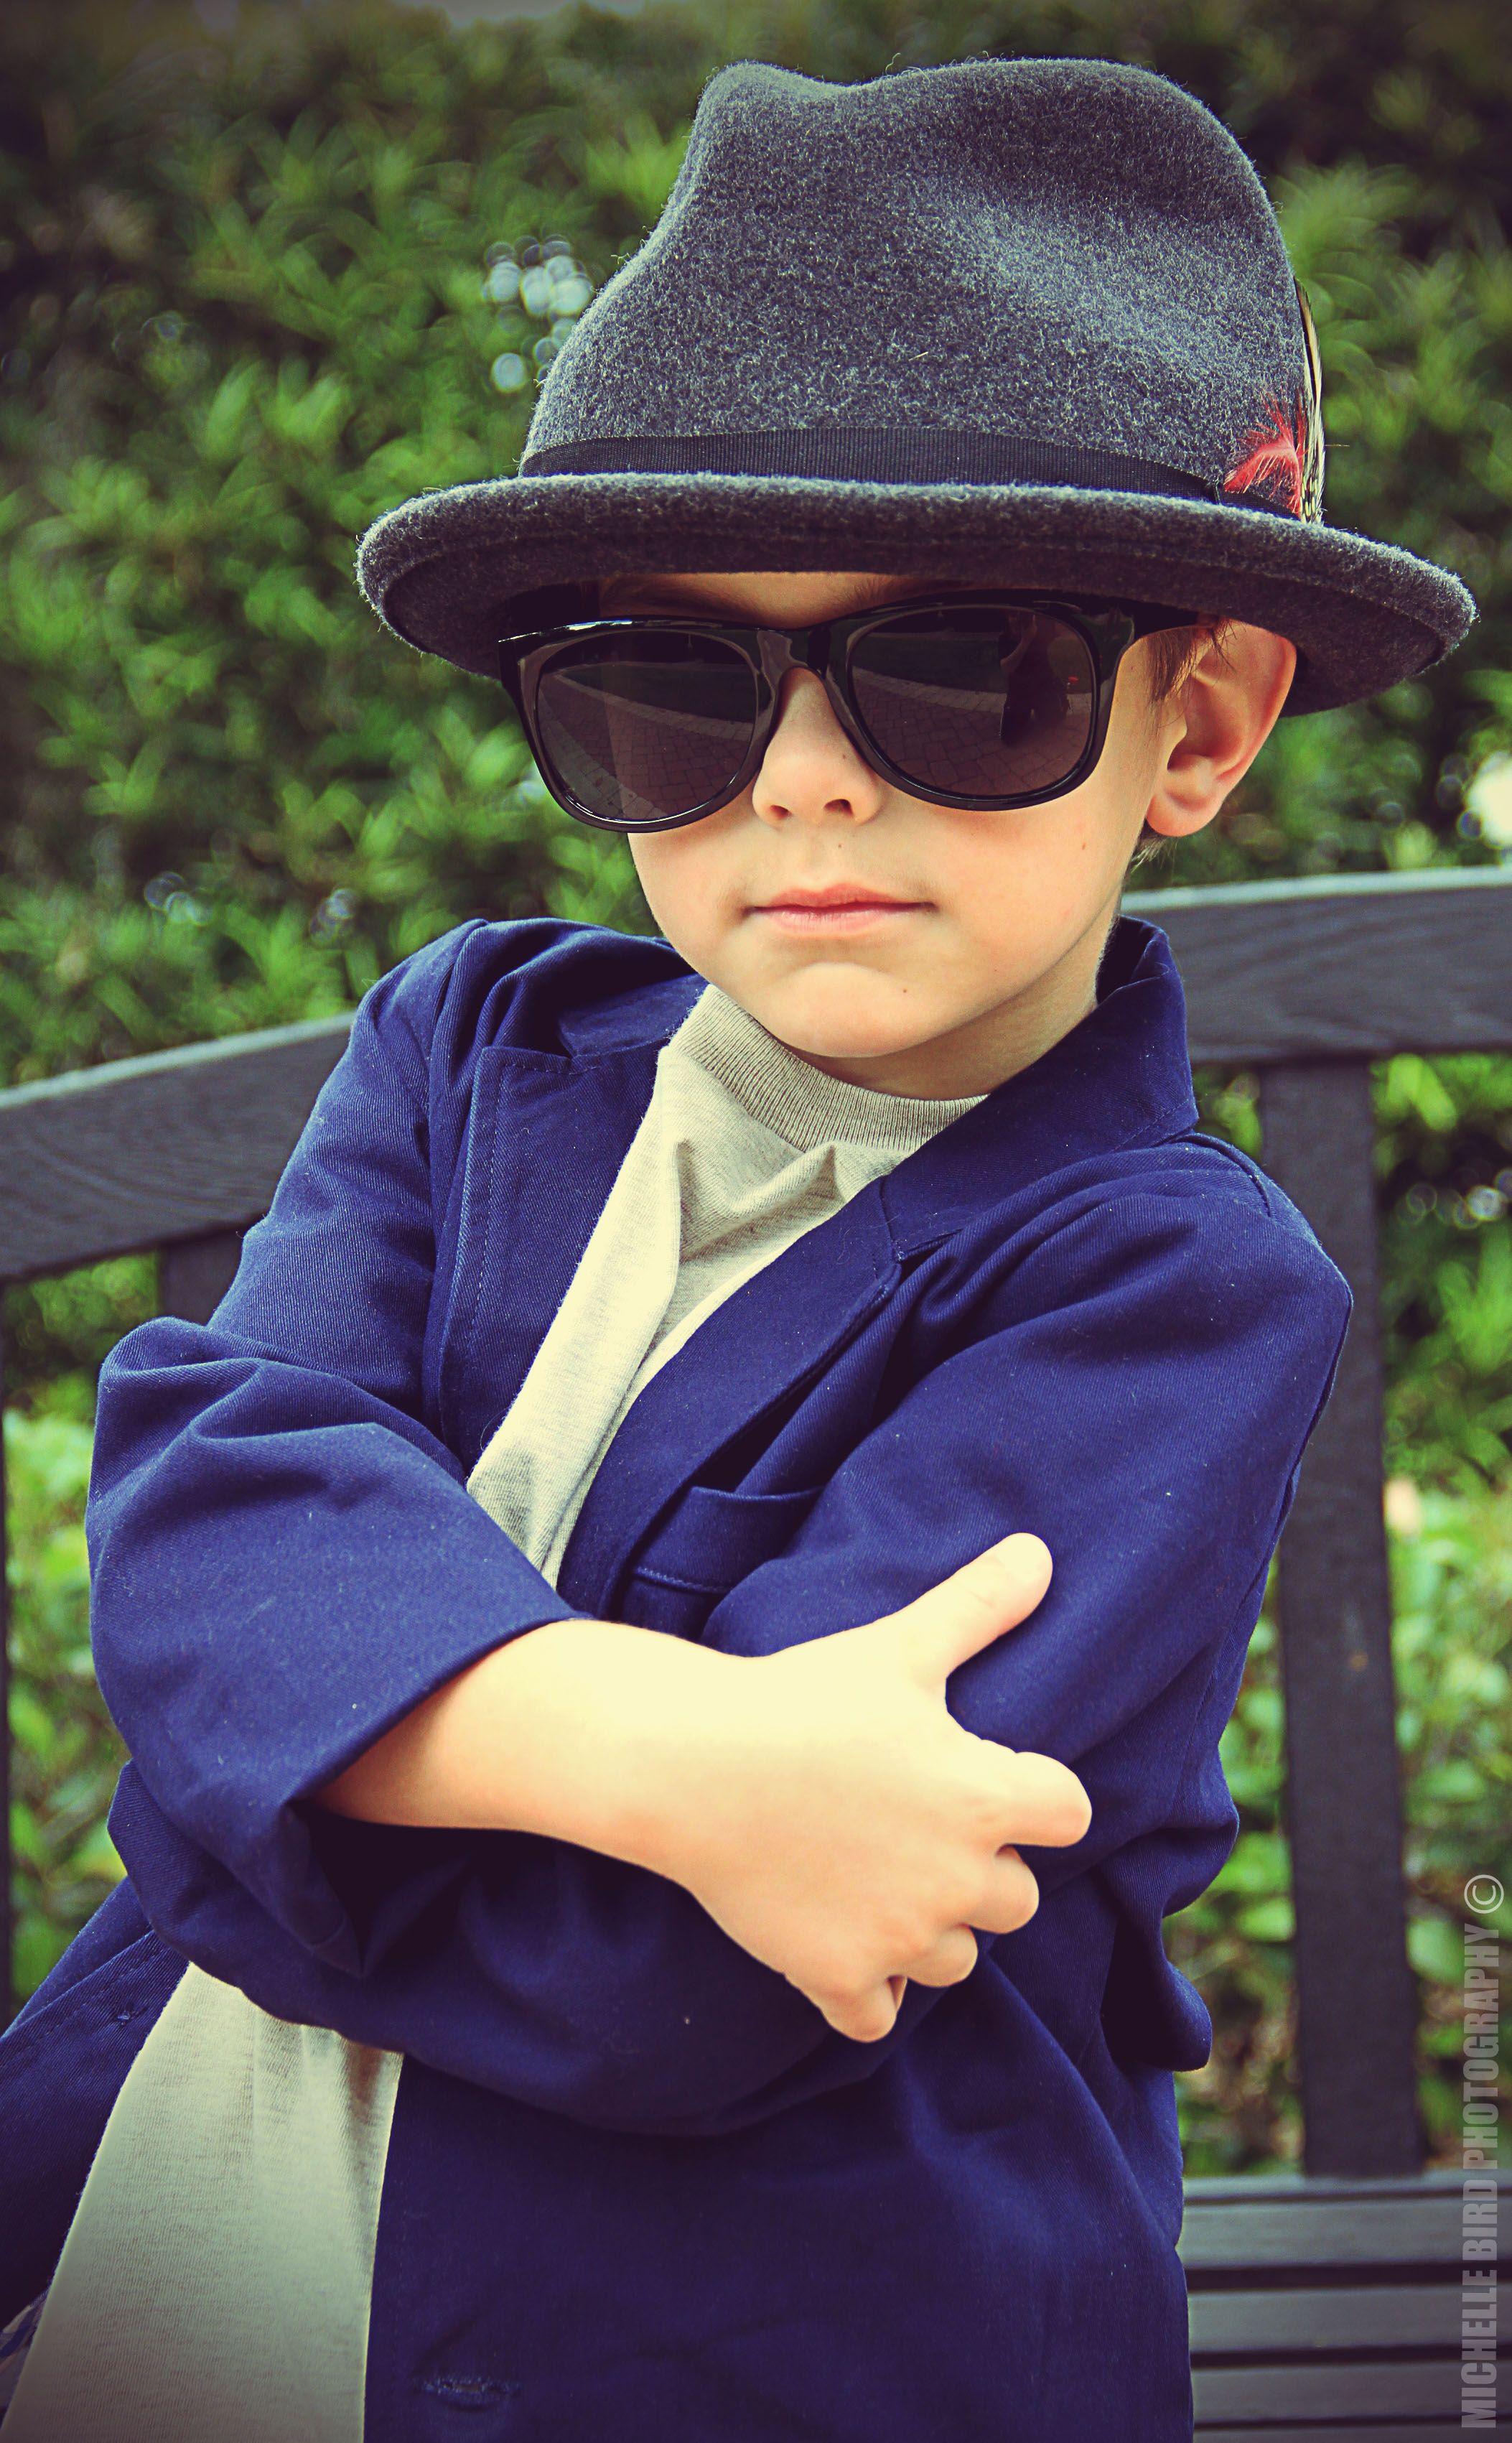 Facebook com/SpreadThaBird #kids #boys #photography #kid